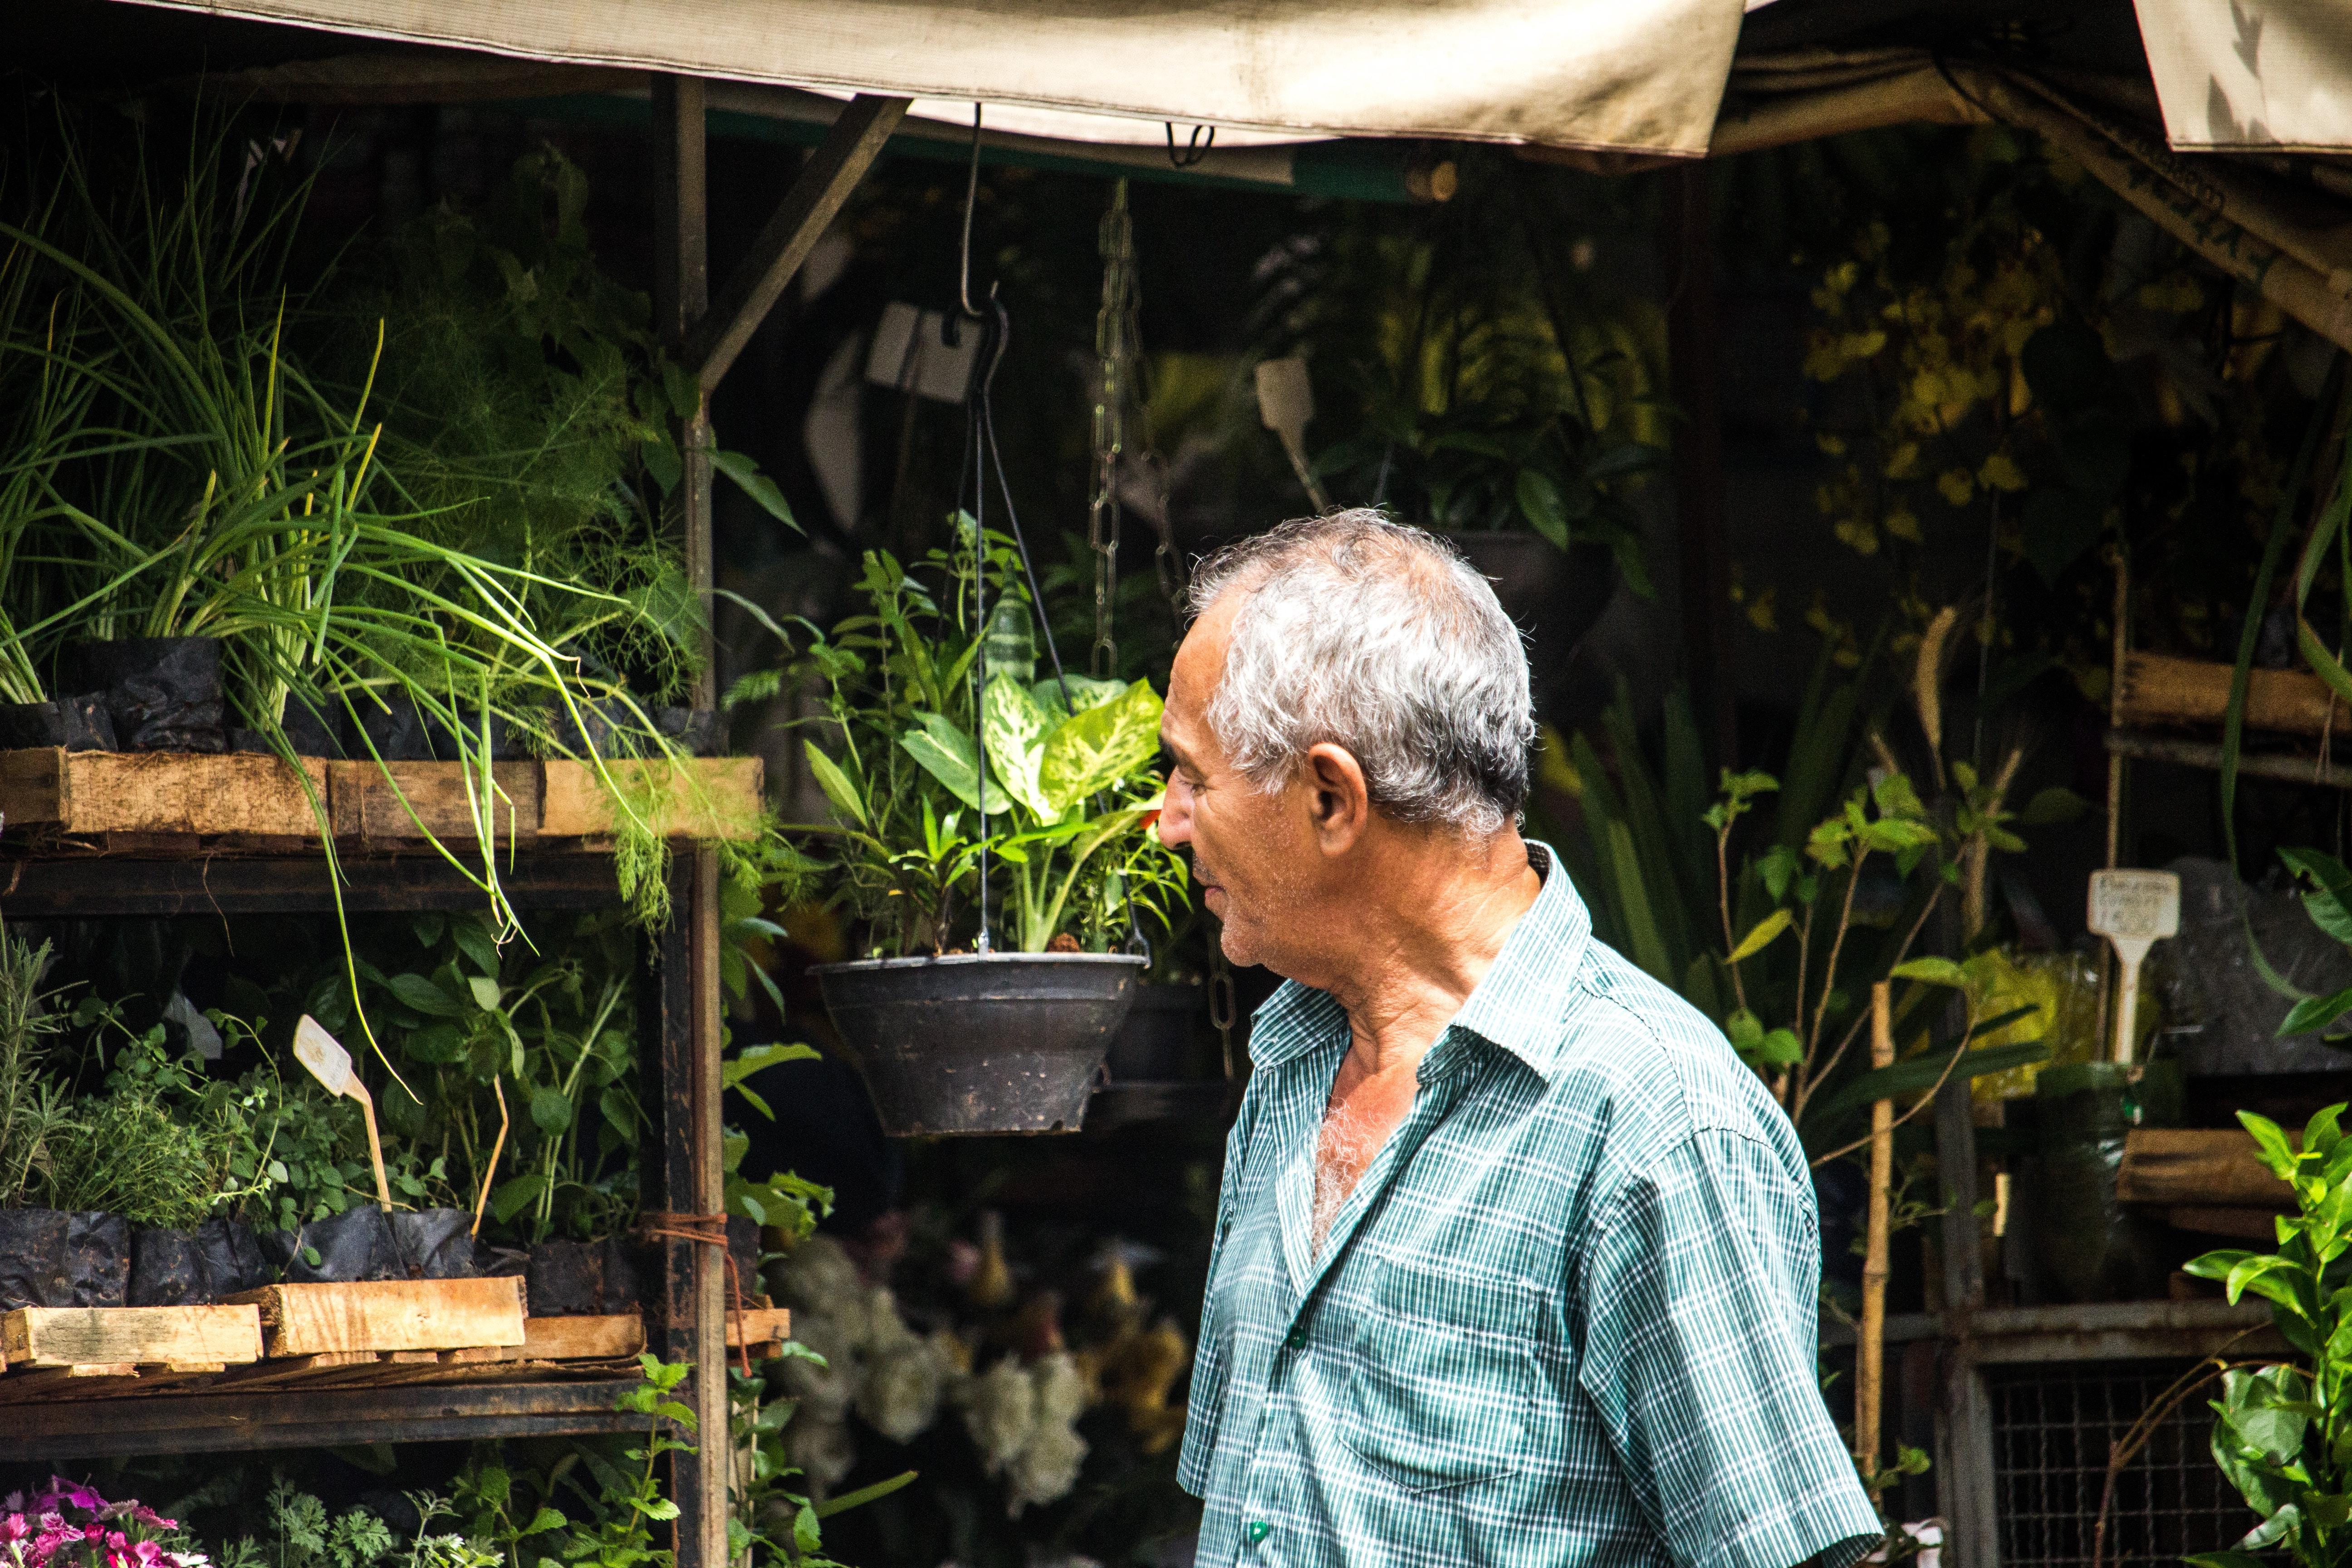 Man in blue button-up t-shirt walks near green leaf plants photo